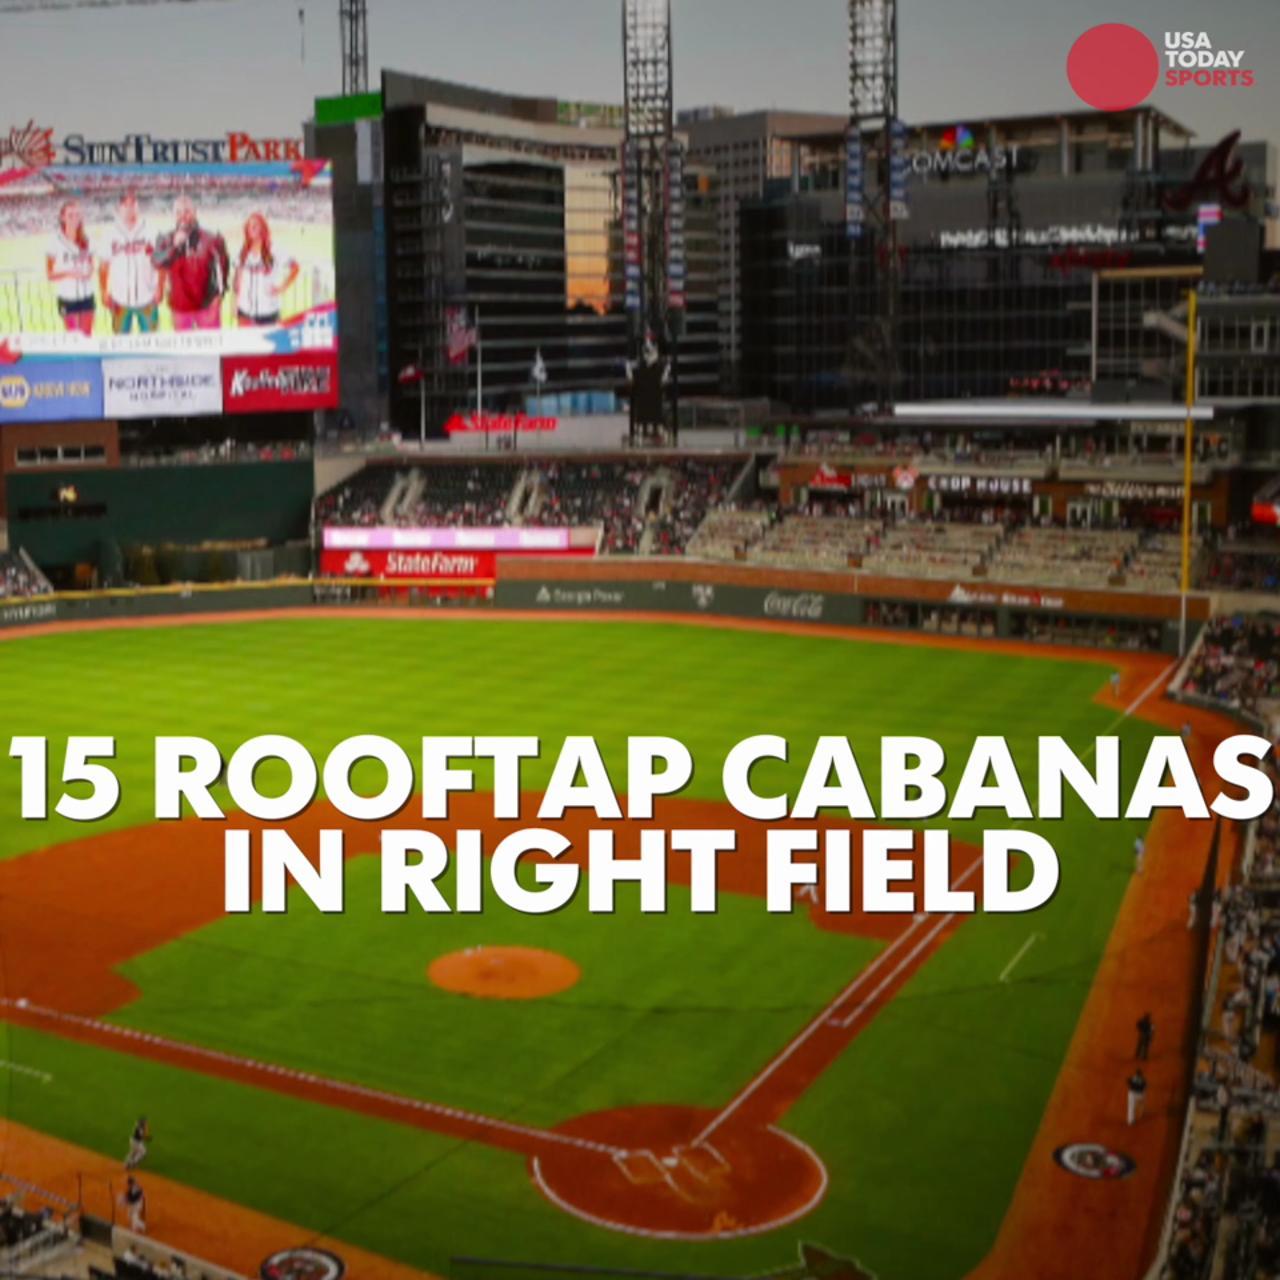 Sun Trust Park: The new home of the Atlanta Braves